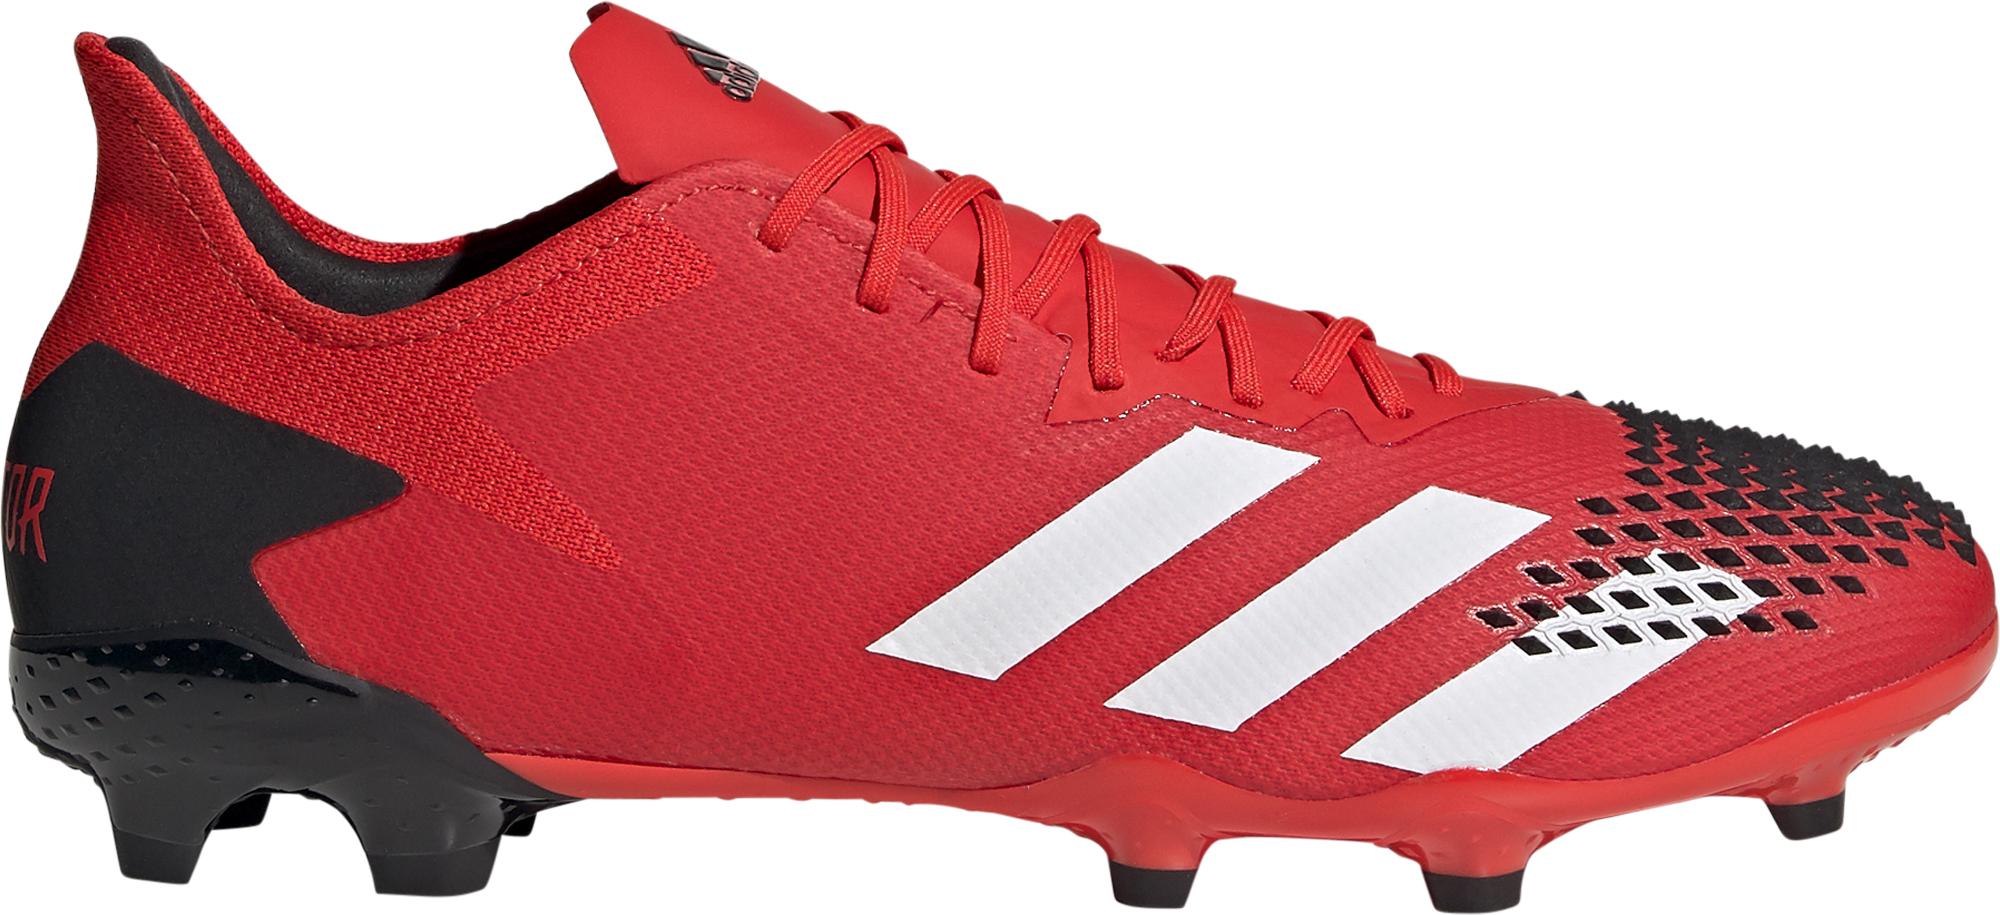 Adidas Бутсы мужские Adidas Predator 20.2 FG, размер 39 бутсы adidas predator 18 3 fg db2001